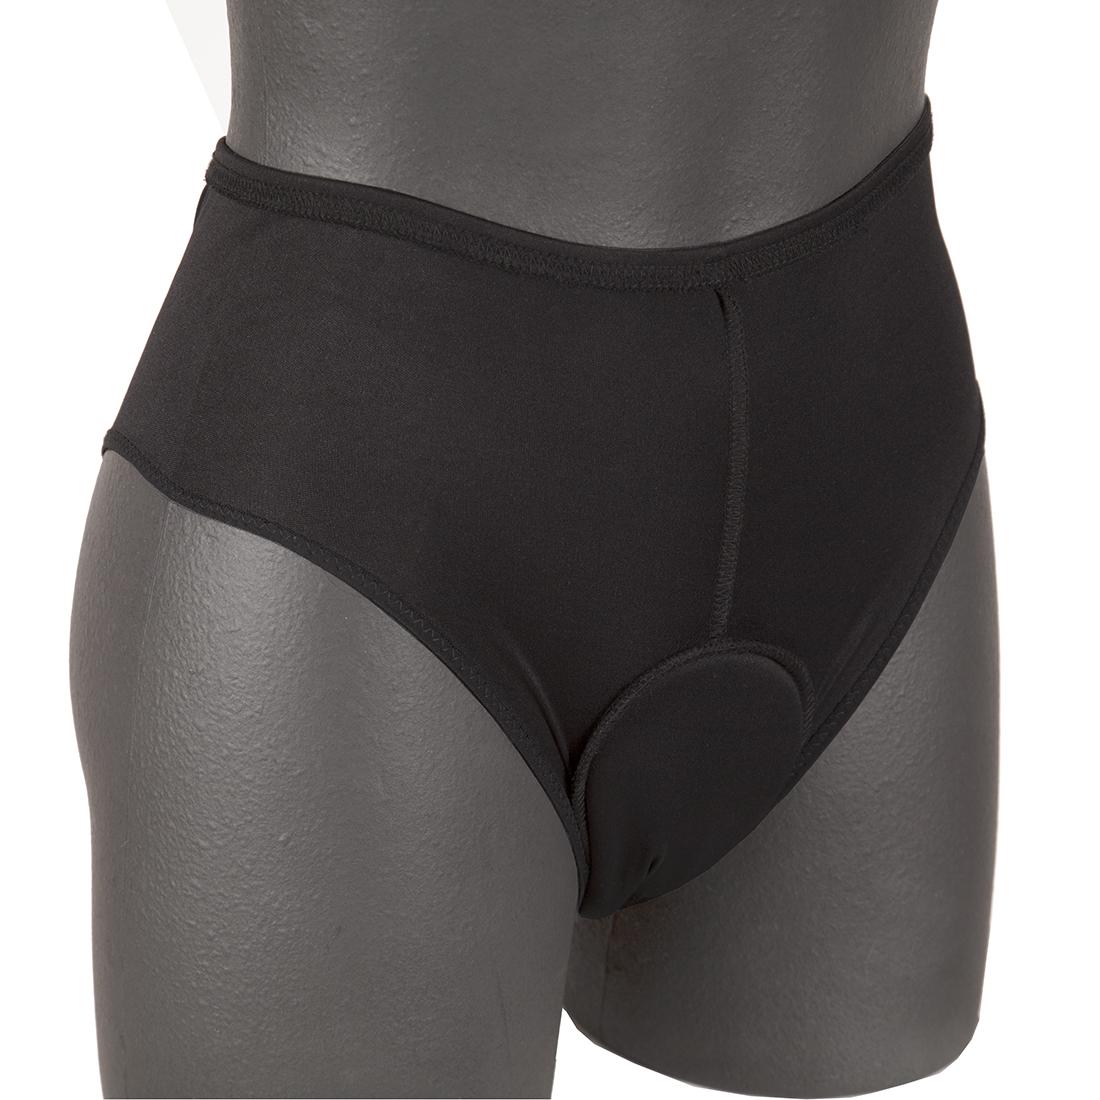 WOMEN'S PADDED BRIEF – Andiamo Underwear